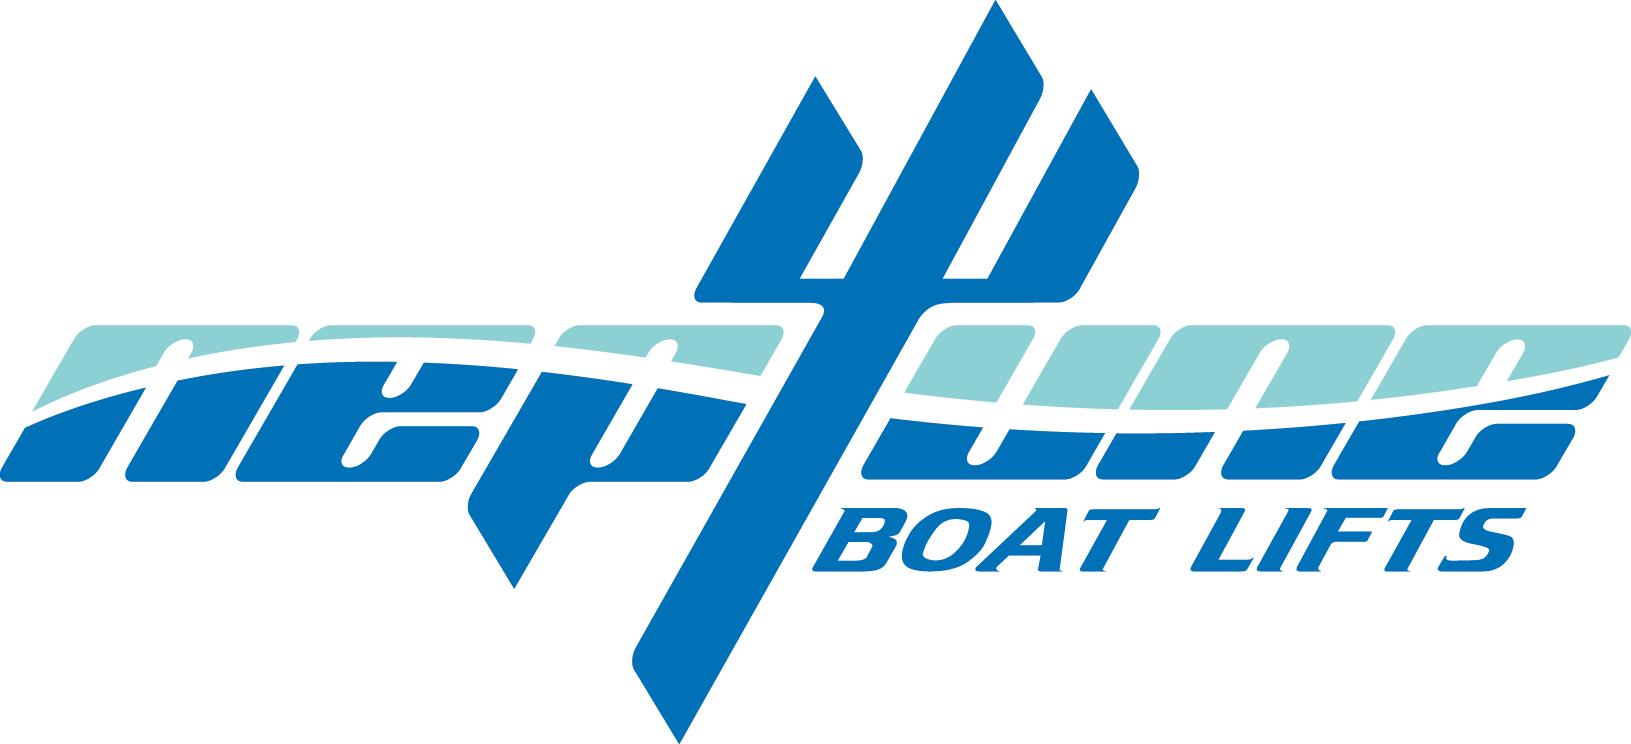 Member News: Neptune Boat Lifts